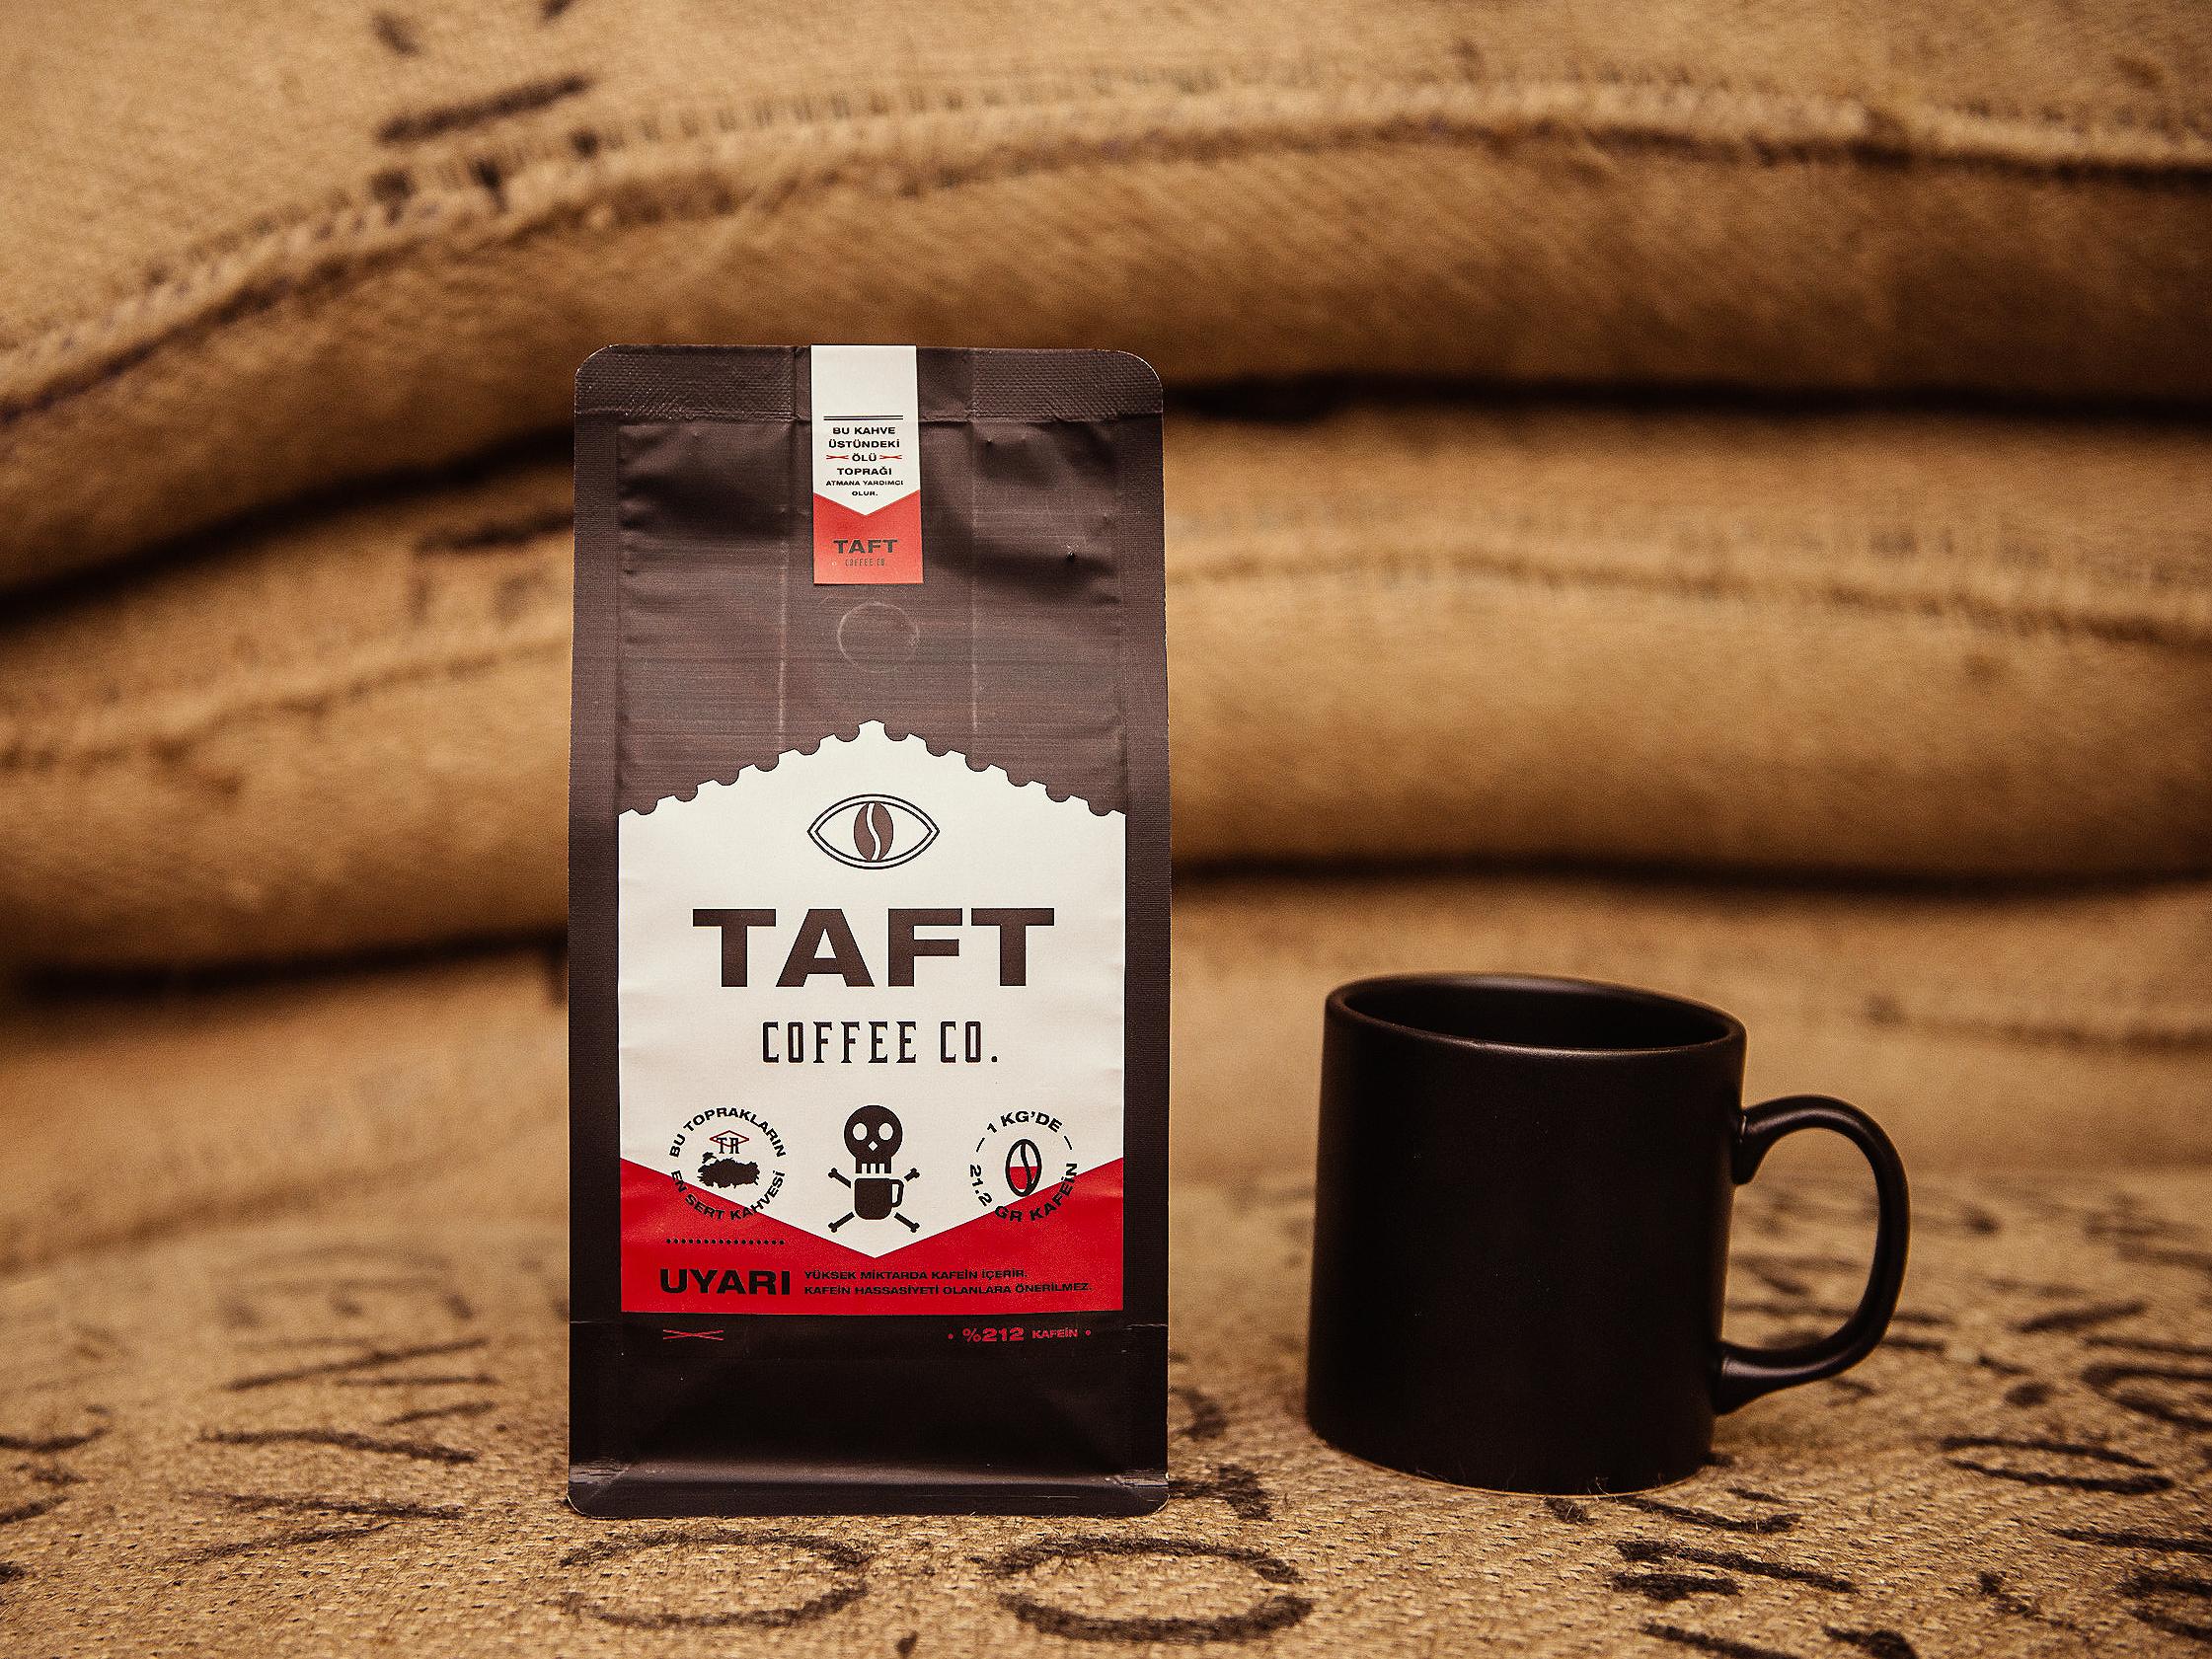 Zeki michael taft cuval coffee etiket tasarimci istanbul kahve genc freelance studio